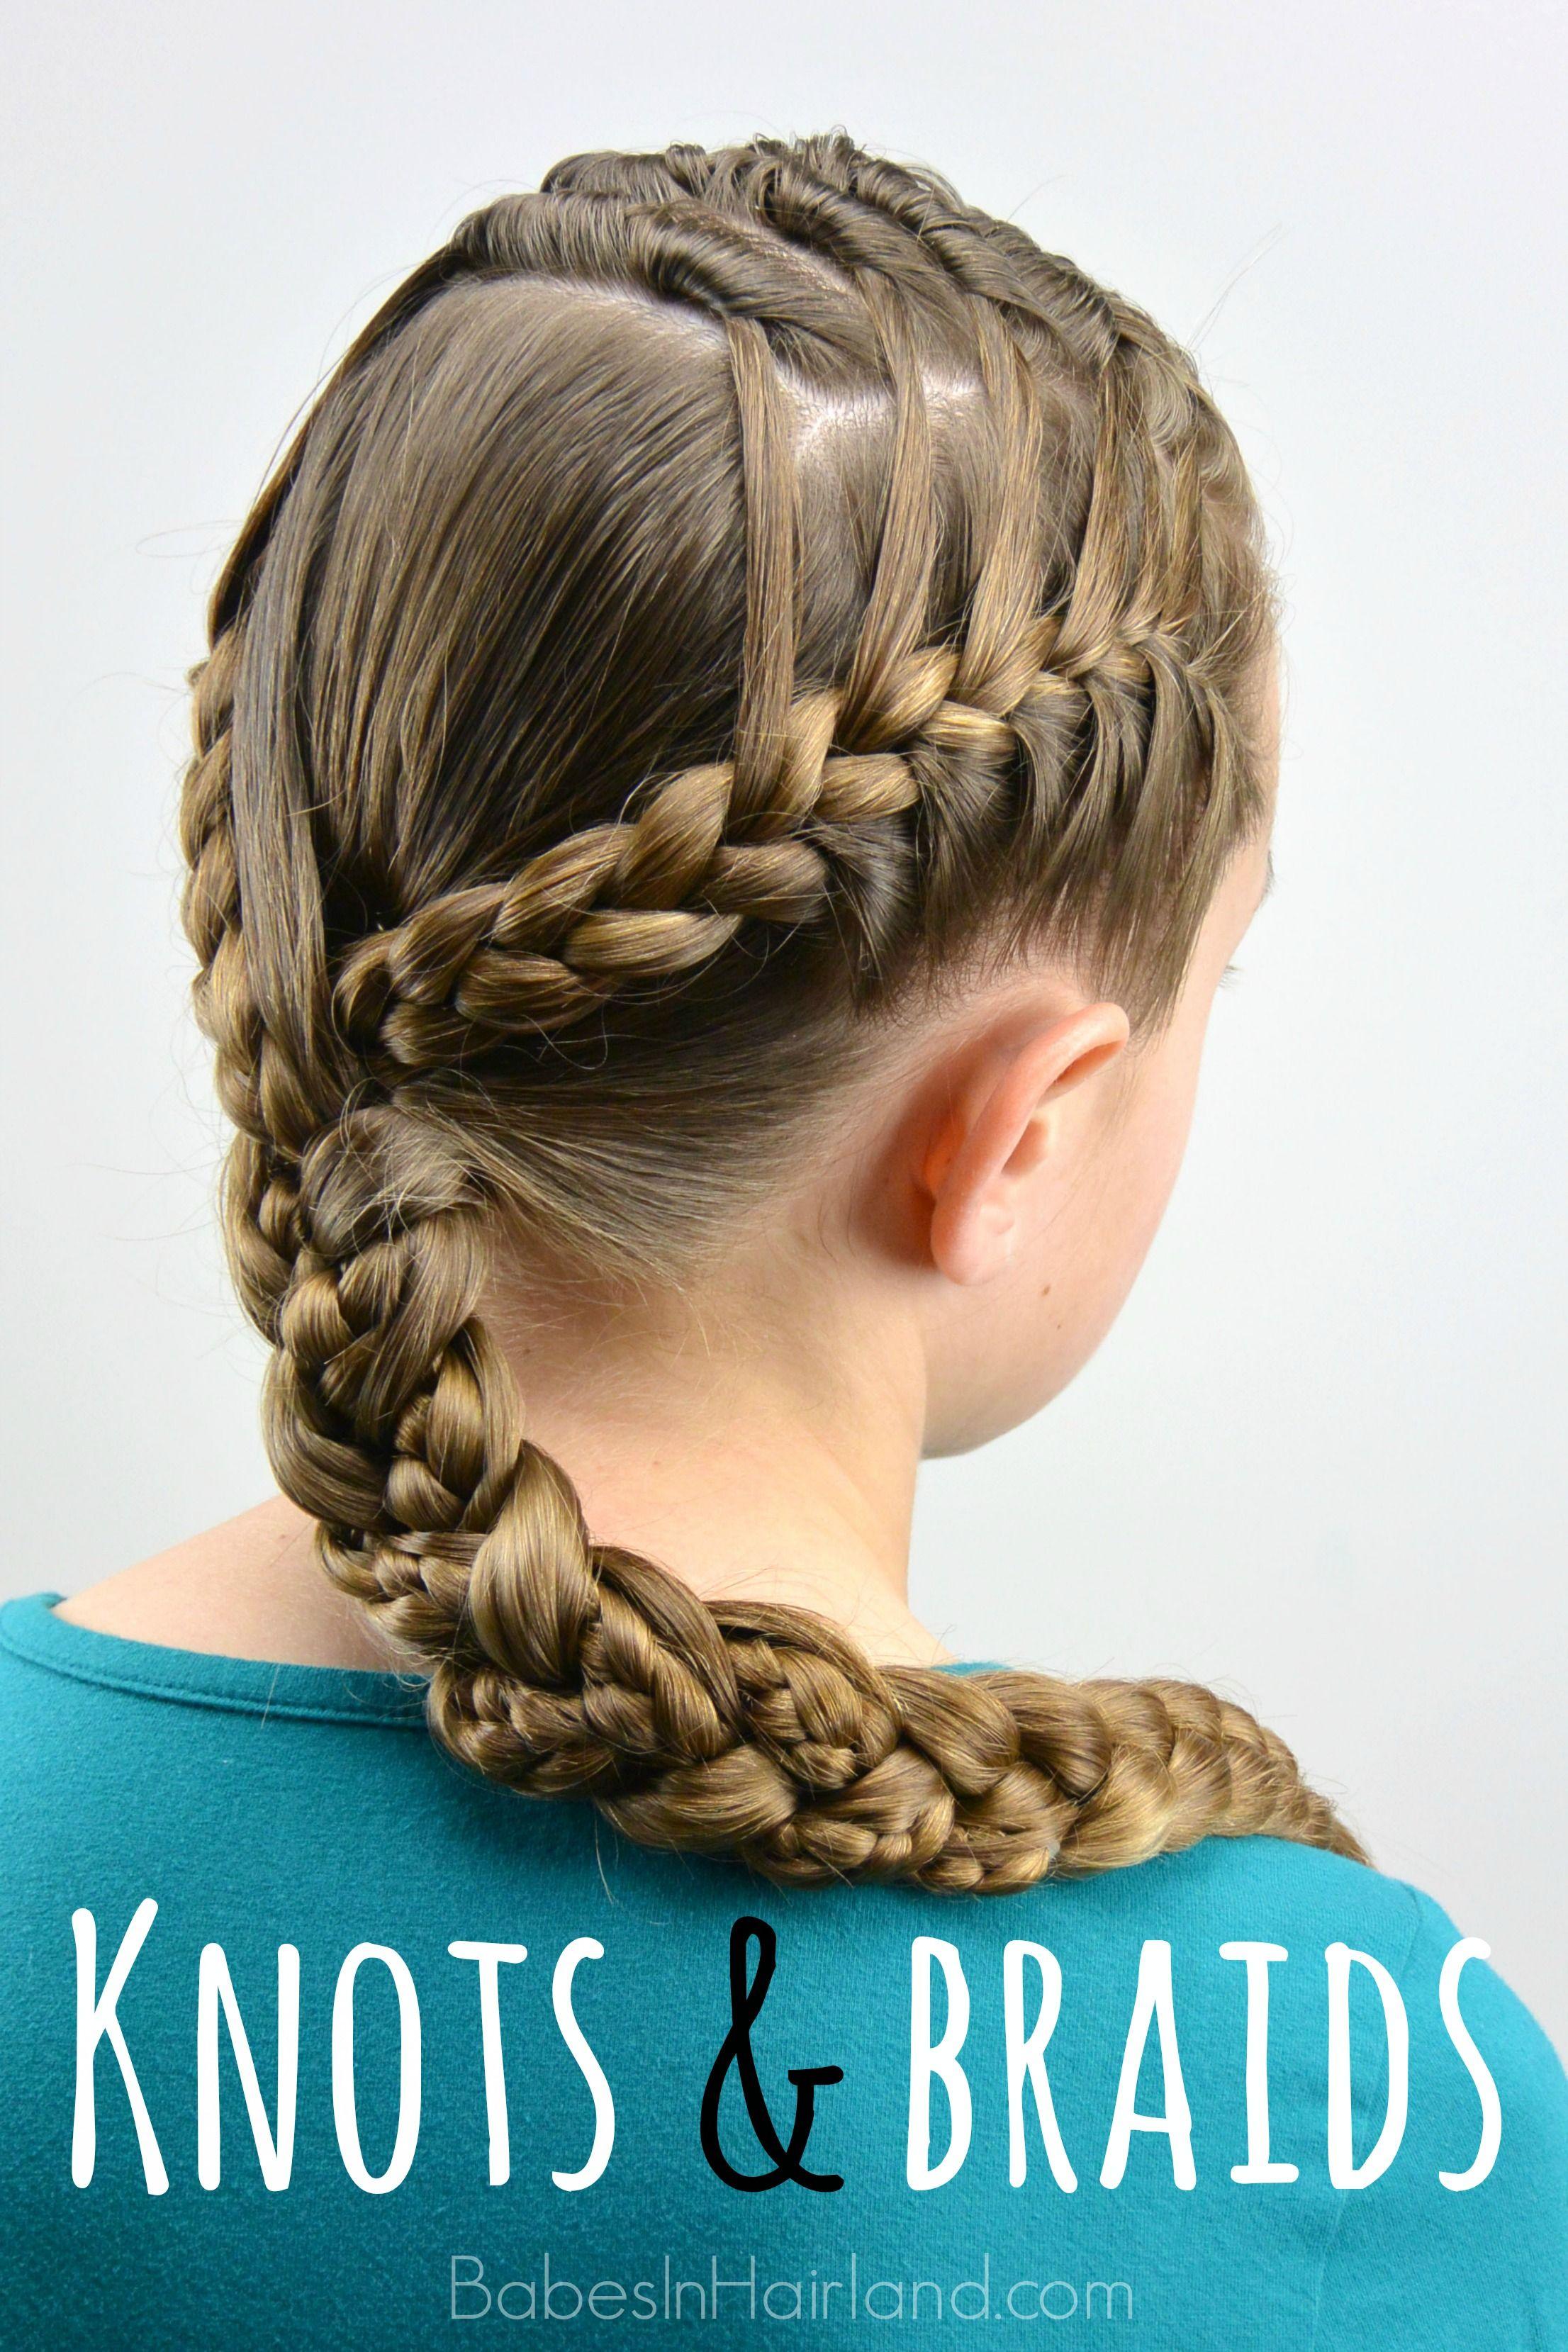 Knots and braids womenus fashion pinterest hair styles braids